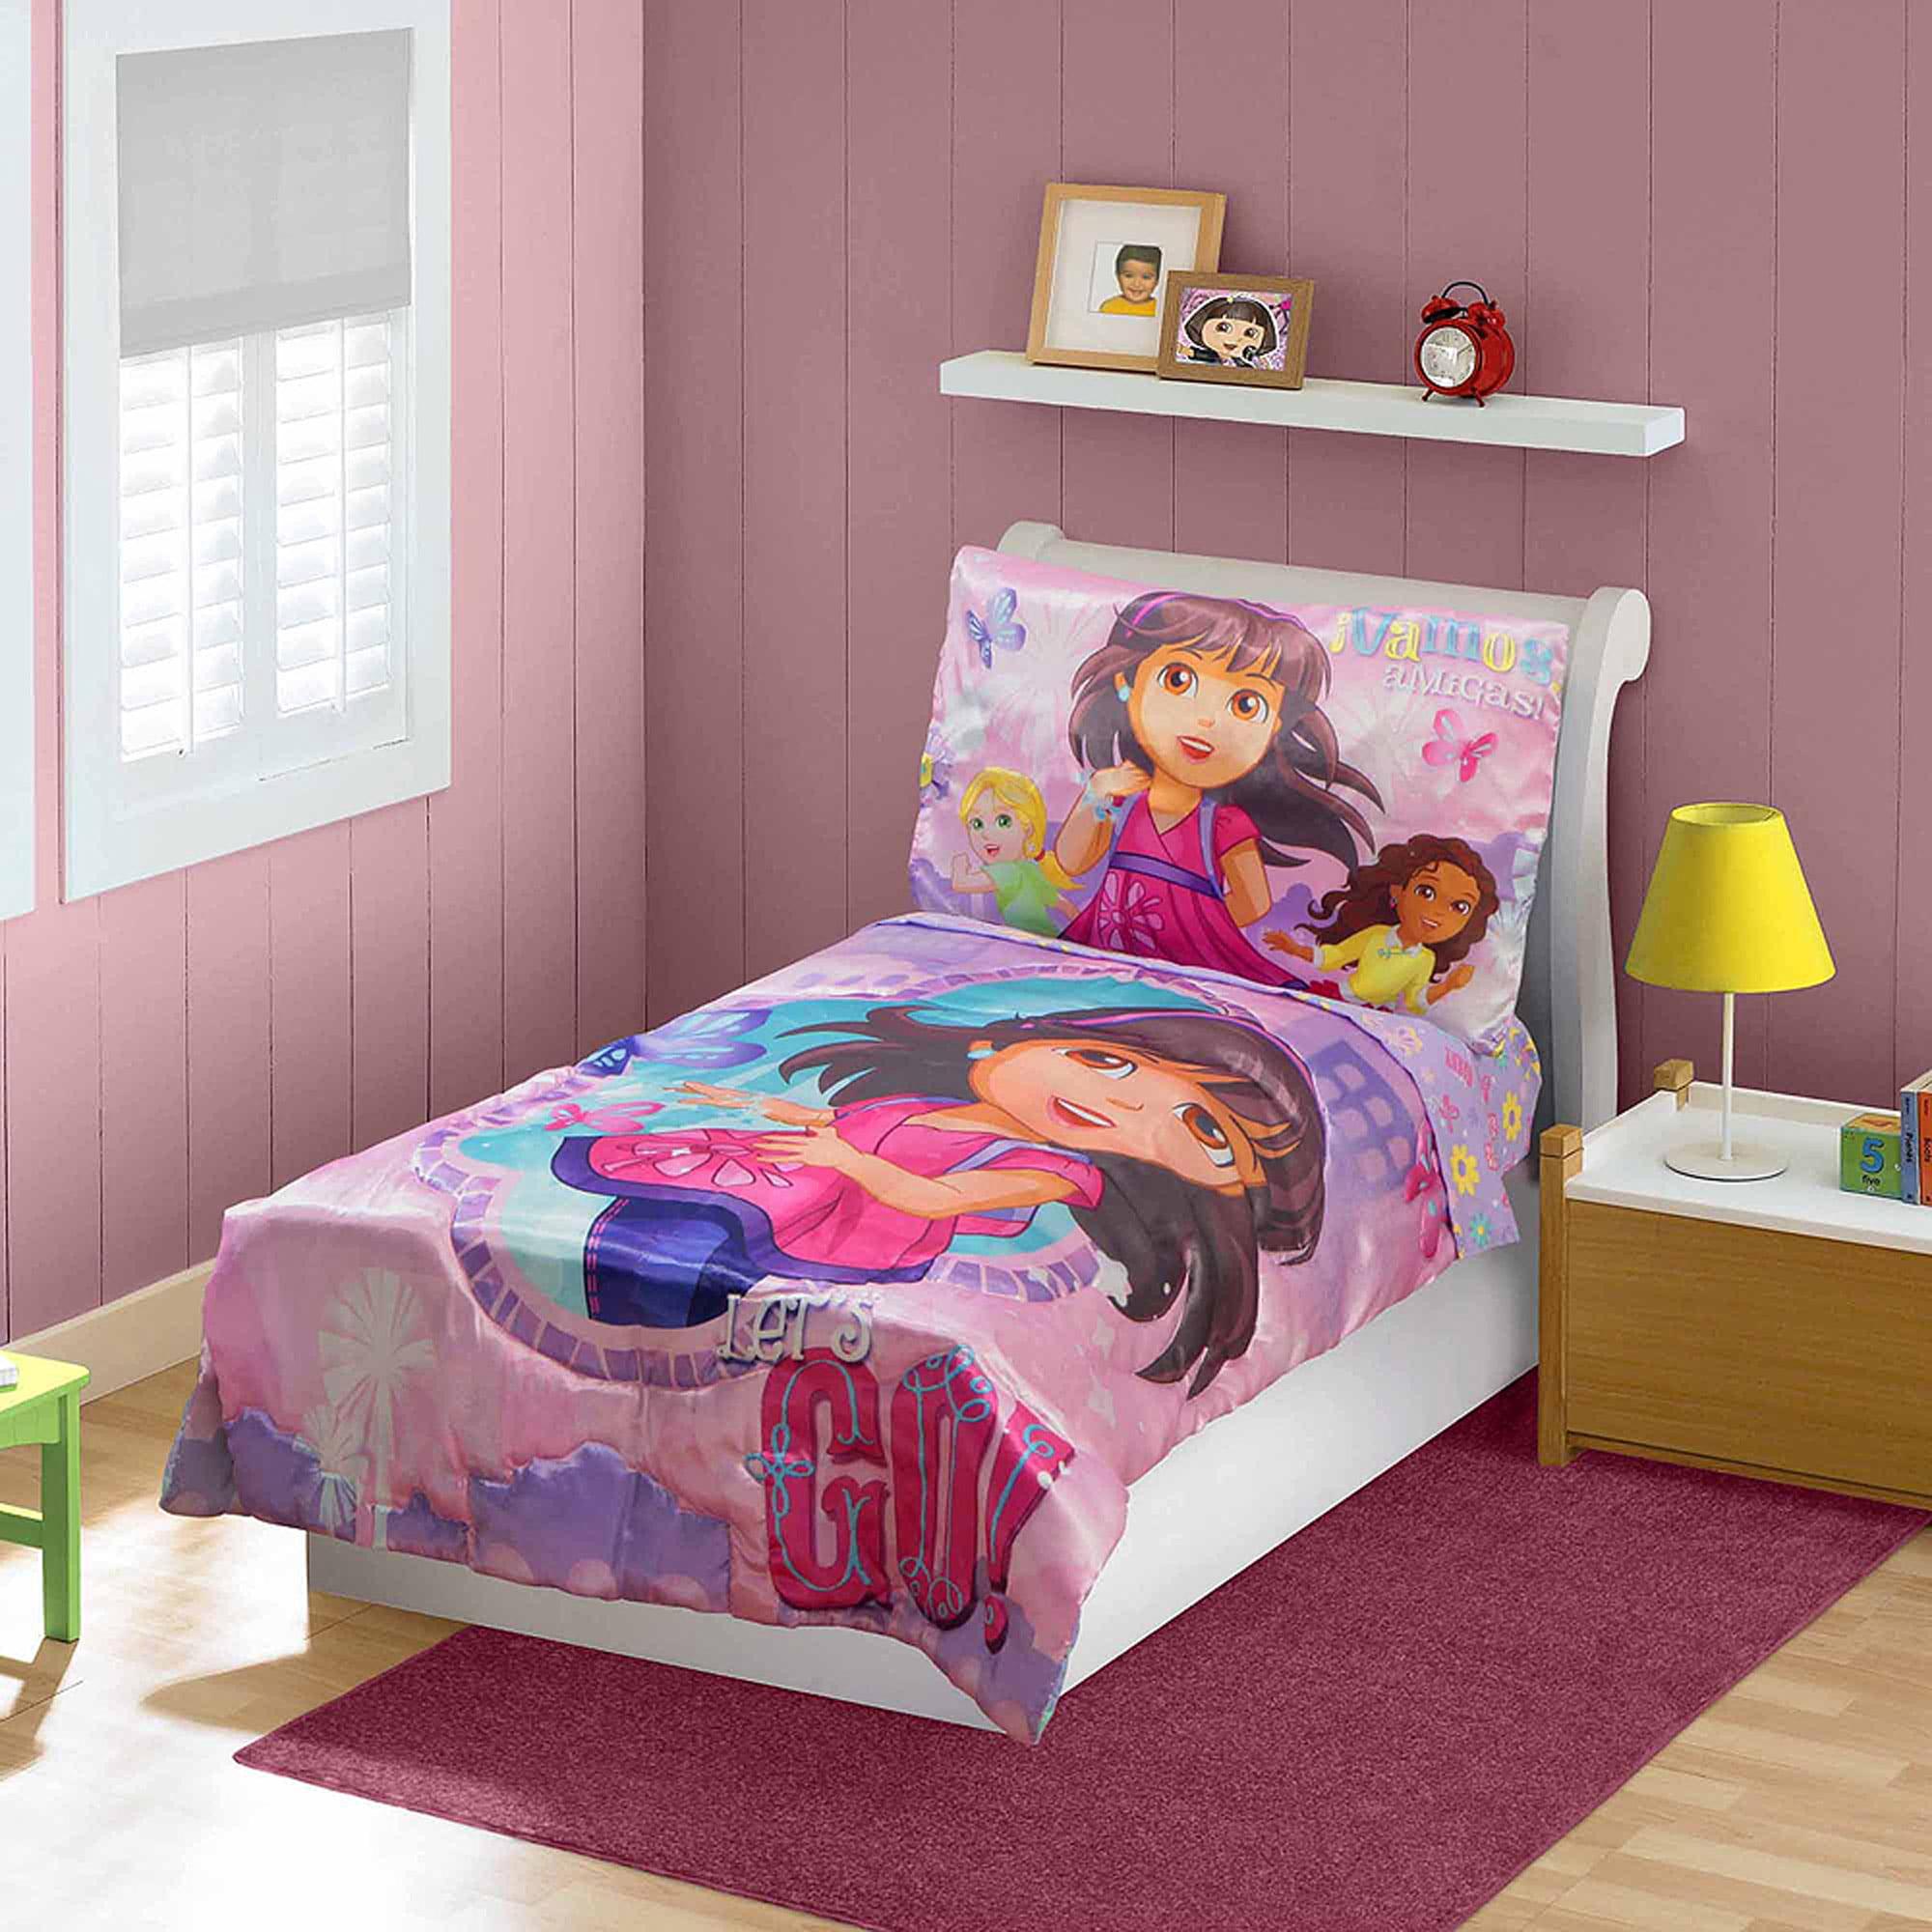 dora amp friends 3 piece toddler bedding set walmart com dora the explorer bedroom set household at hnhco